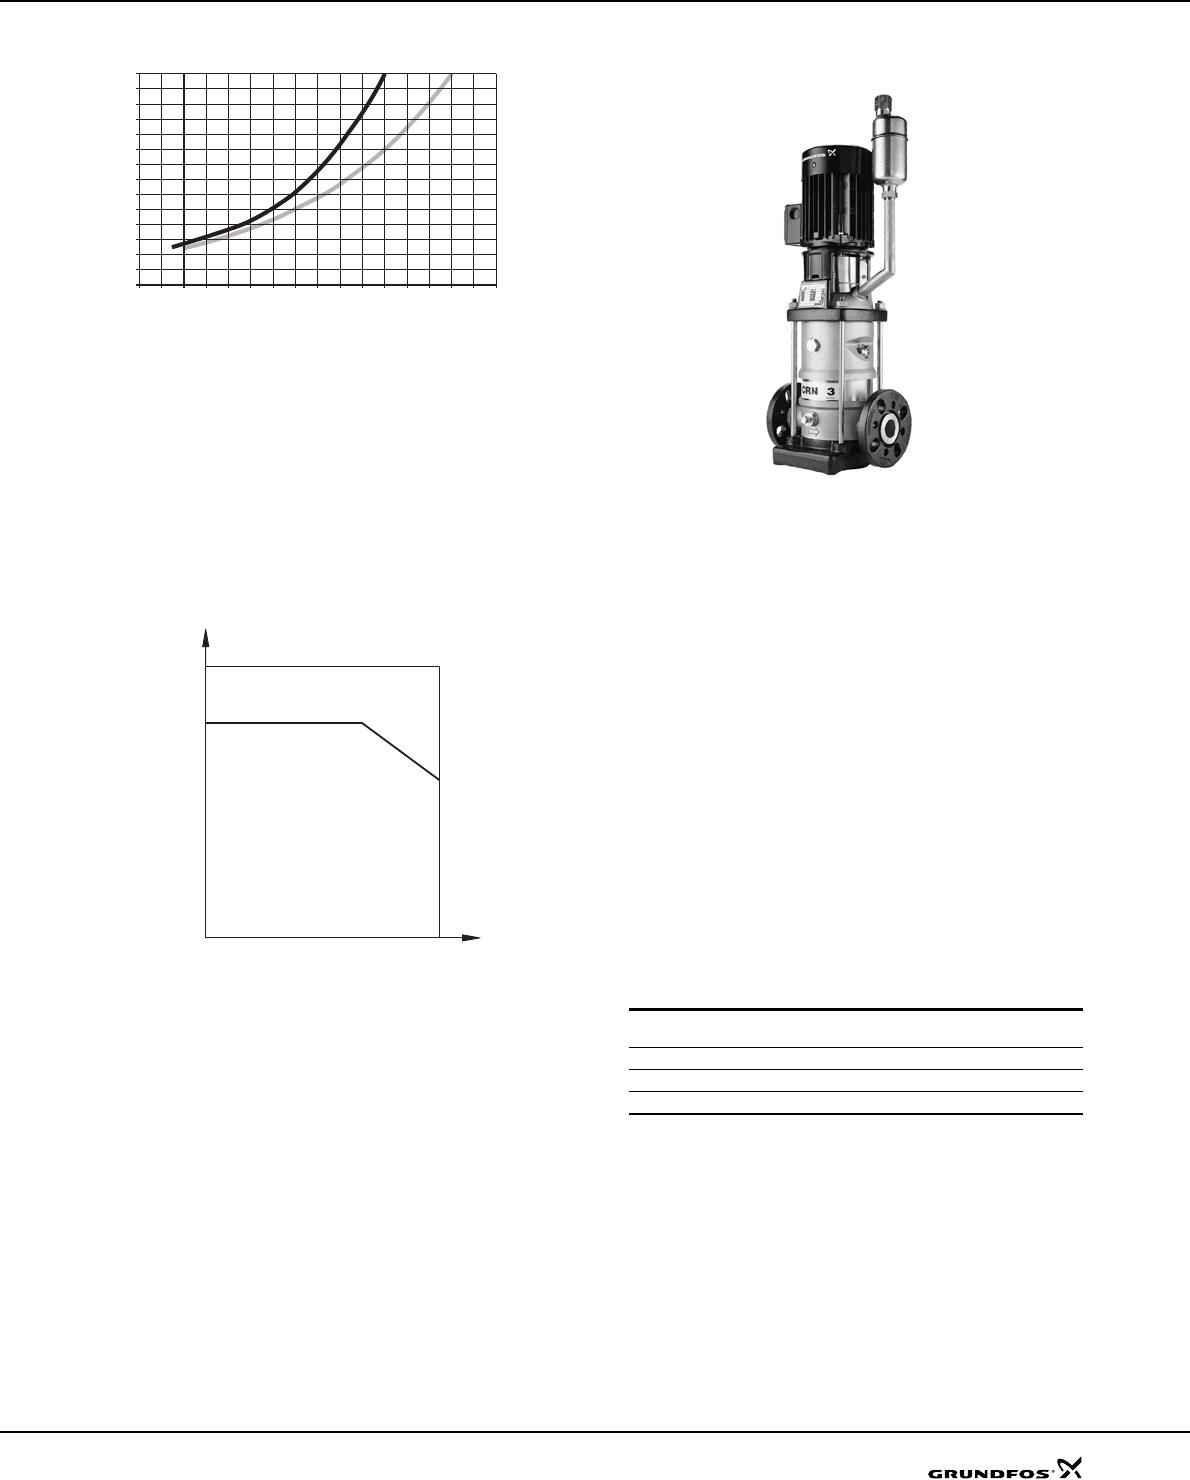 547666 1 Grundfos Shaft Seal Booklet